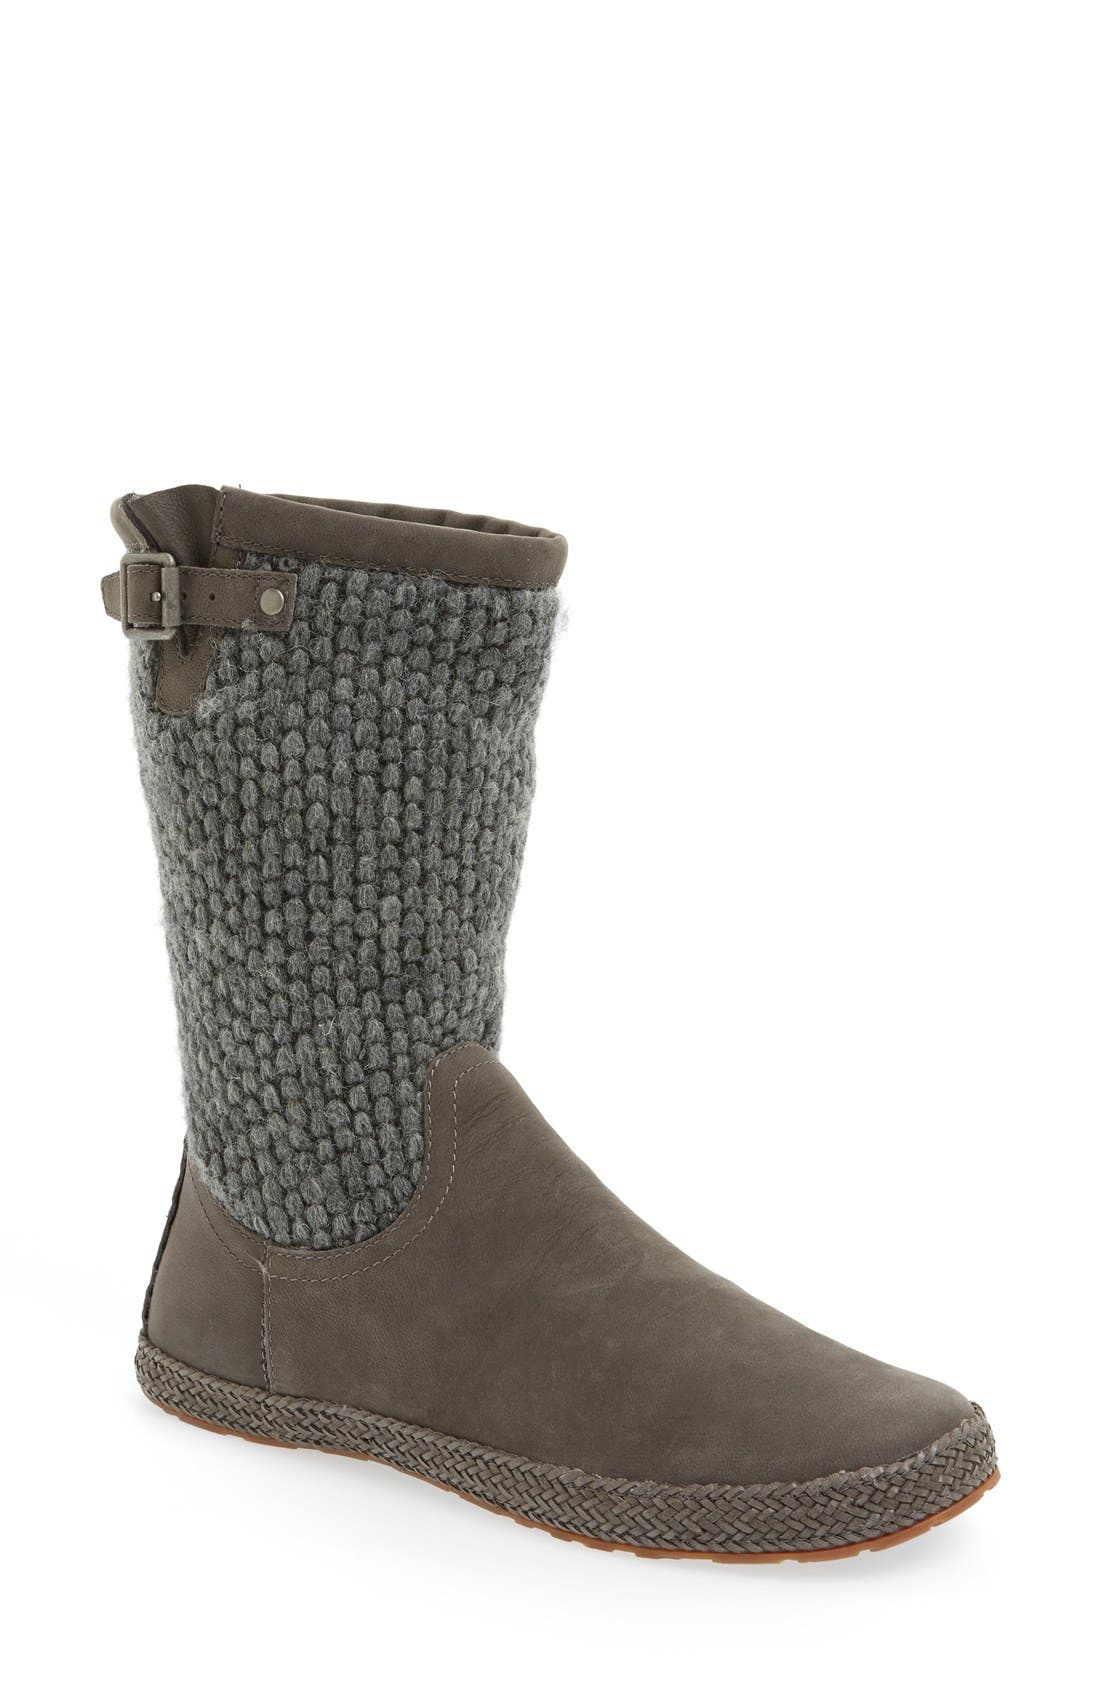 Alternate Image 1 Selected - UGG® 'Lyza' Boot (Women)